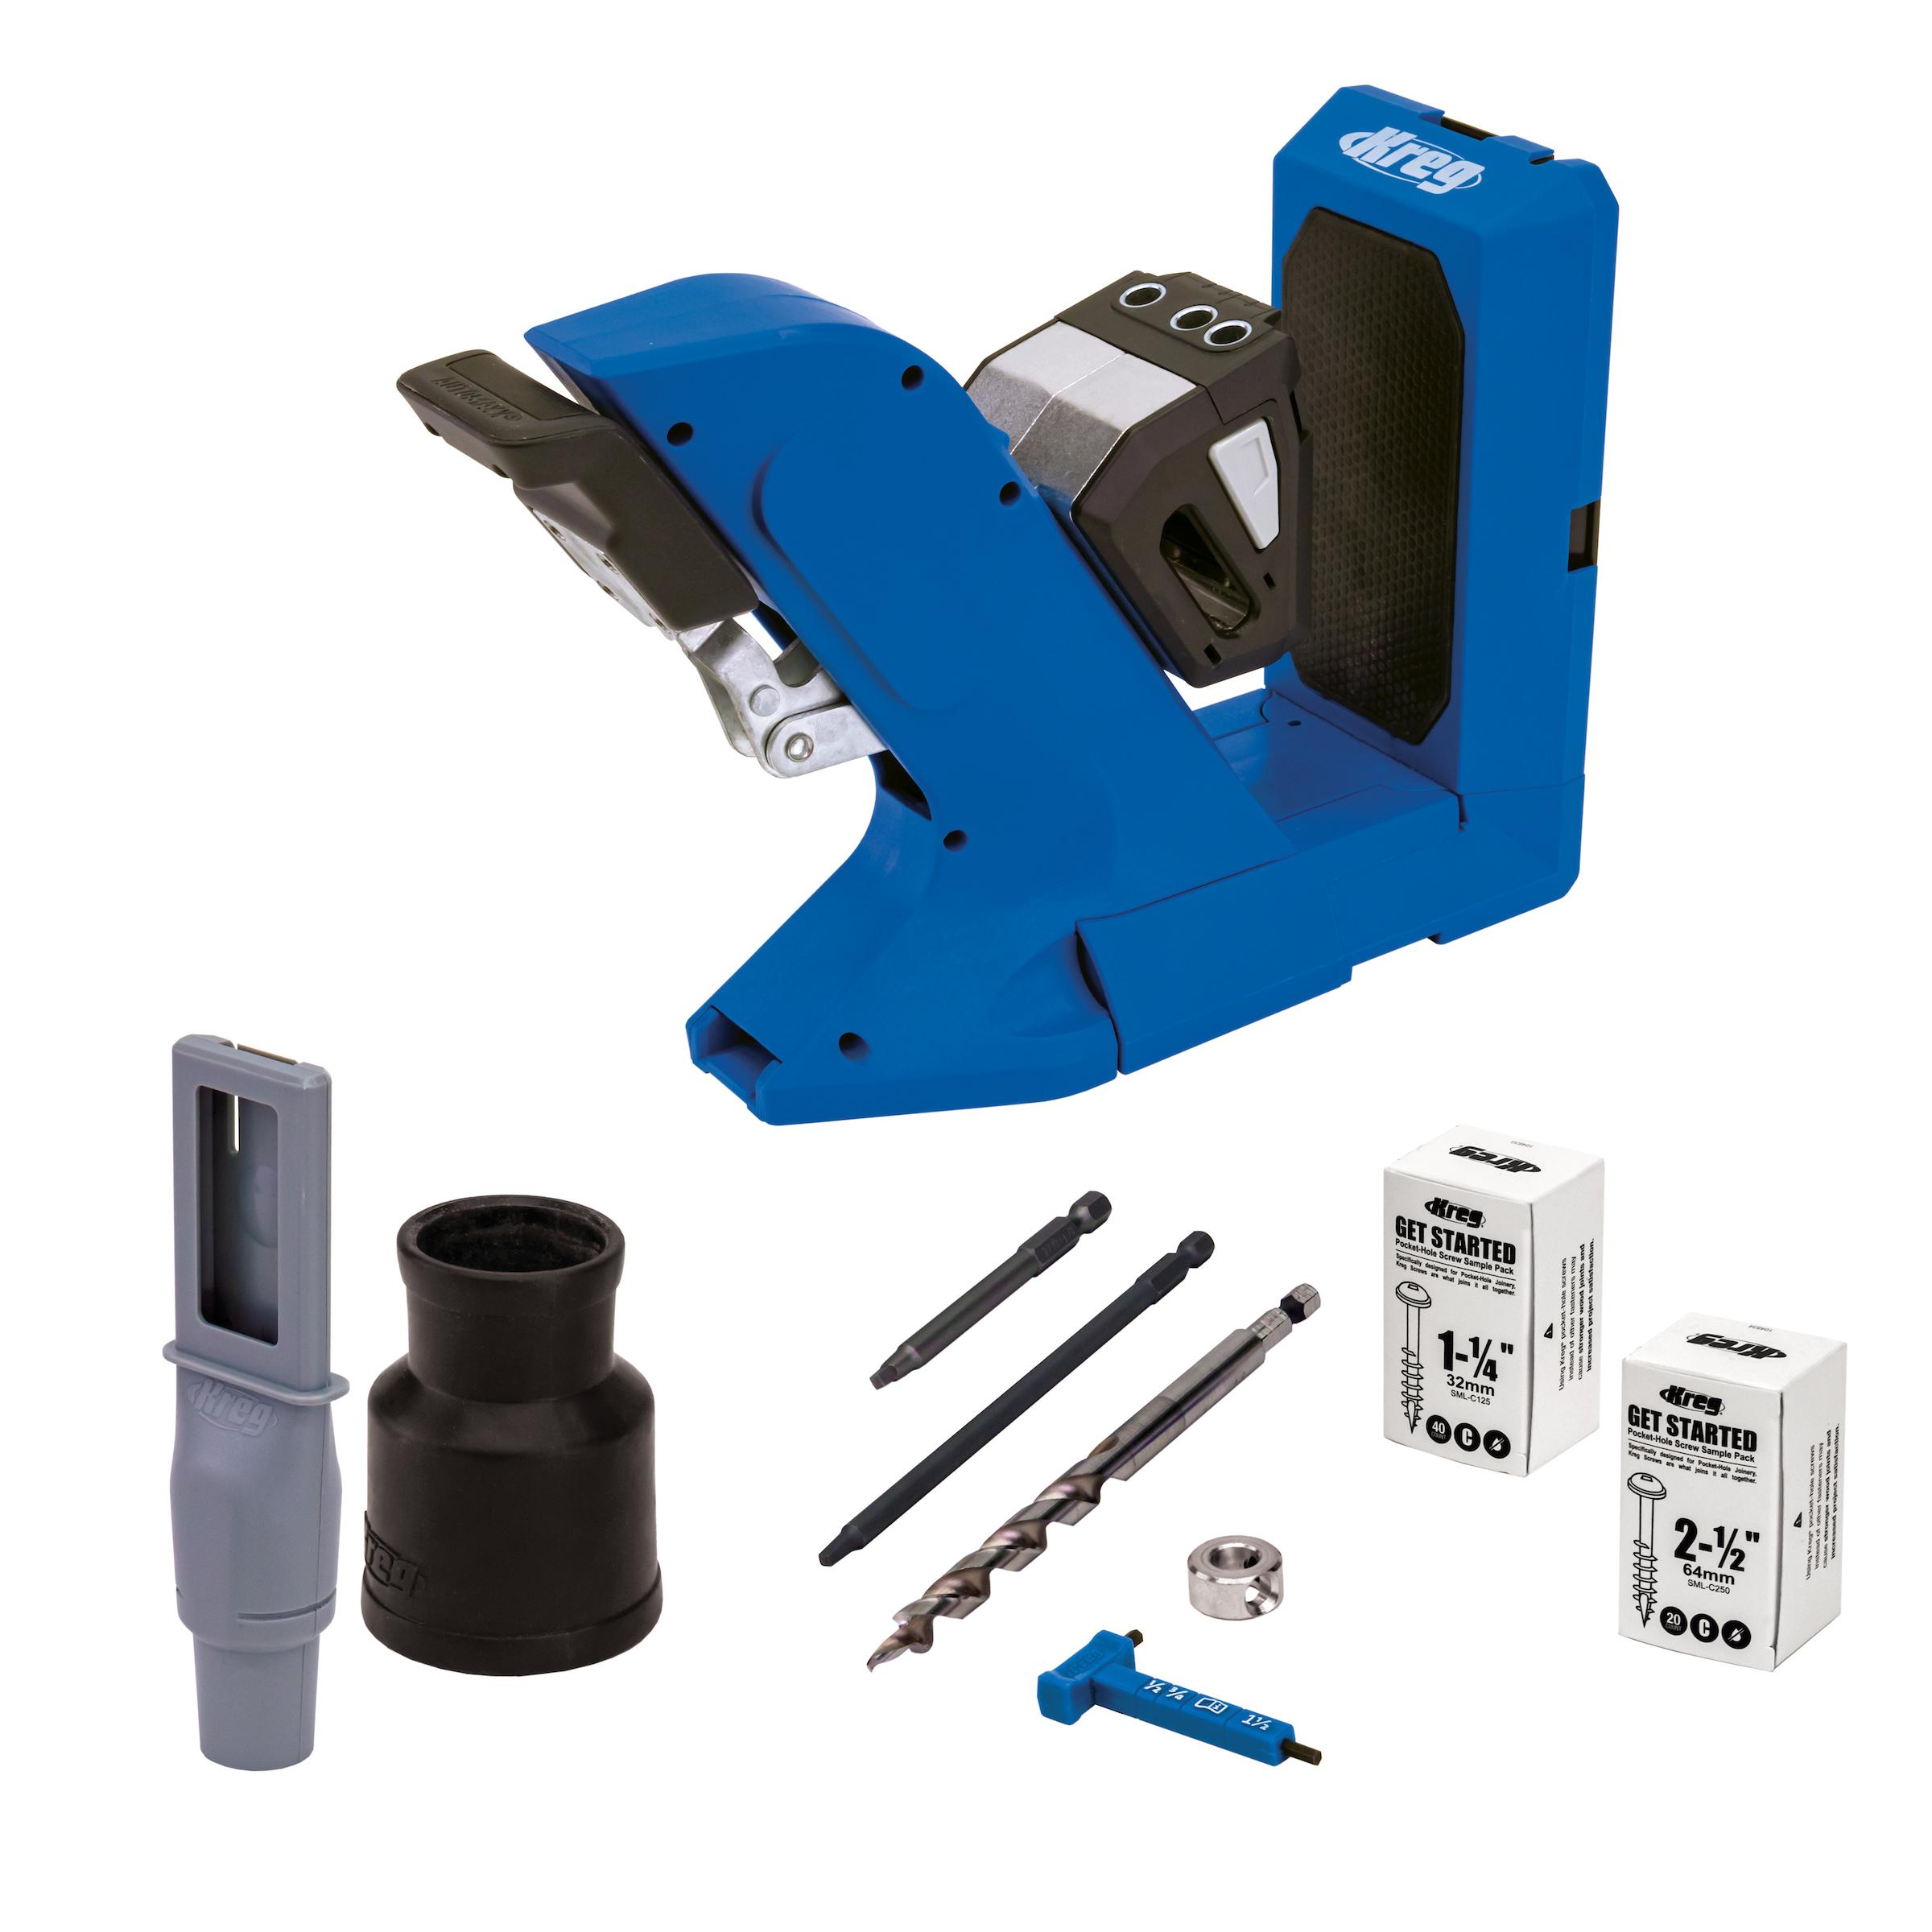 Kreg Pocket-Hole Jig® 720